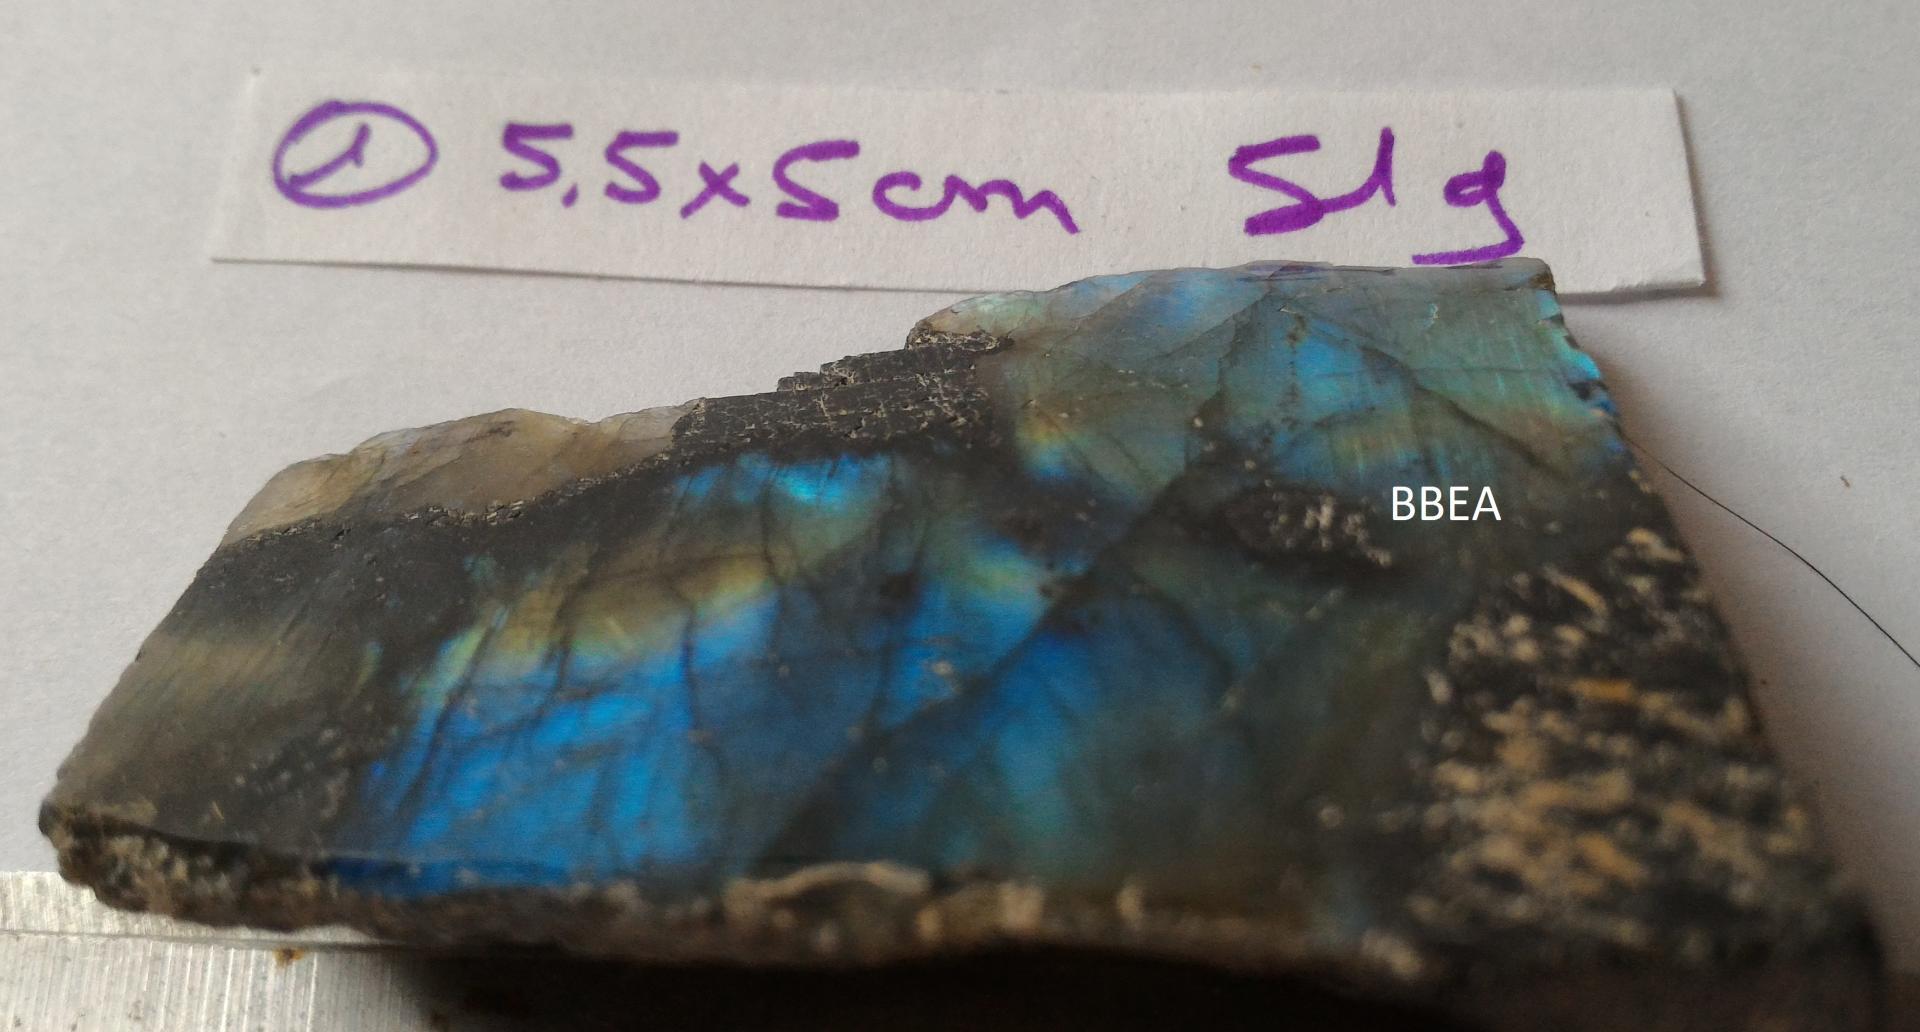 Labradorite 1 face n 1 51g 5 5x5cm 1